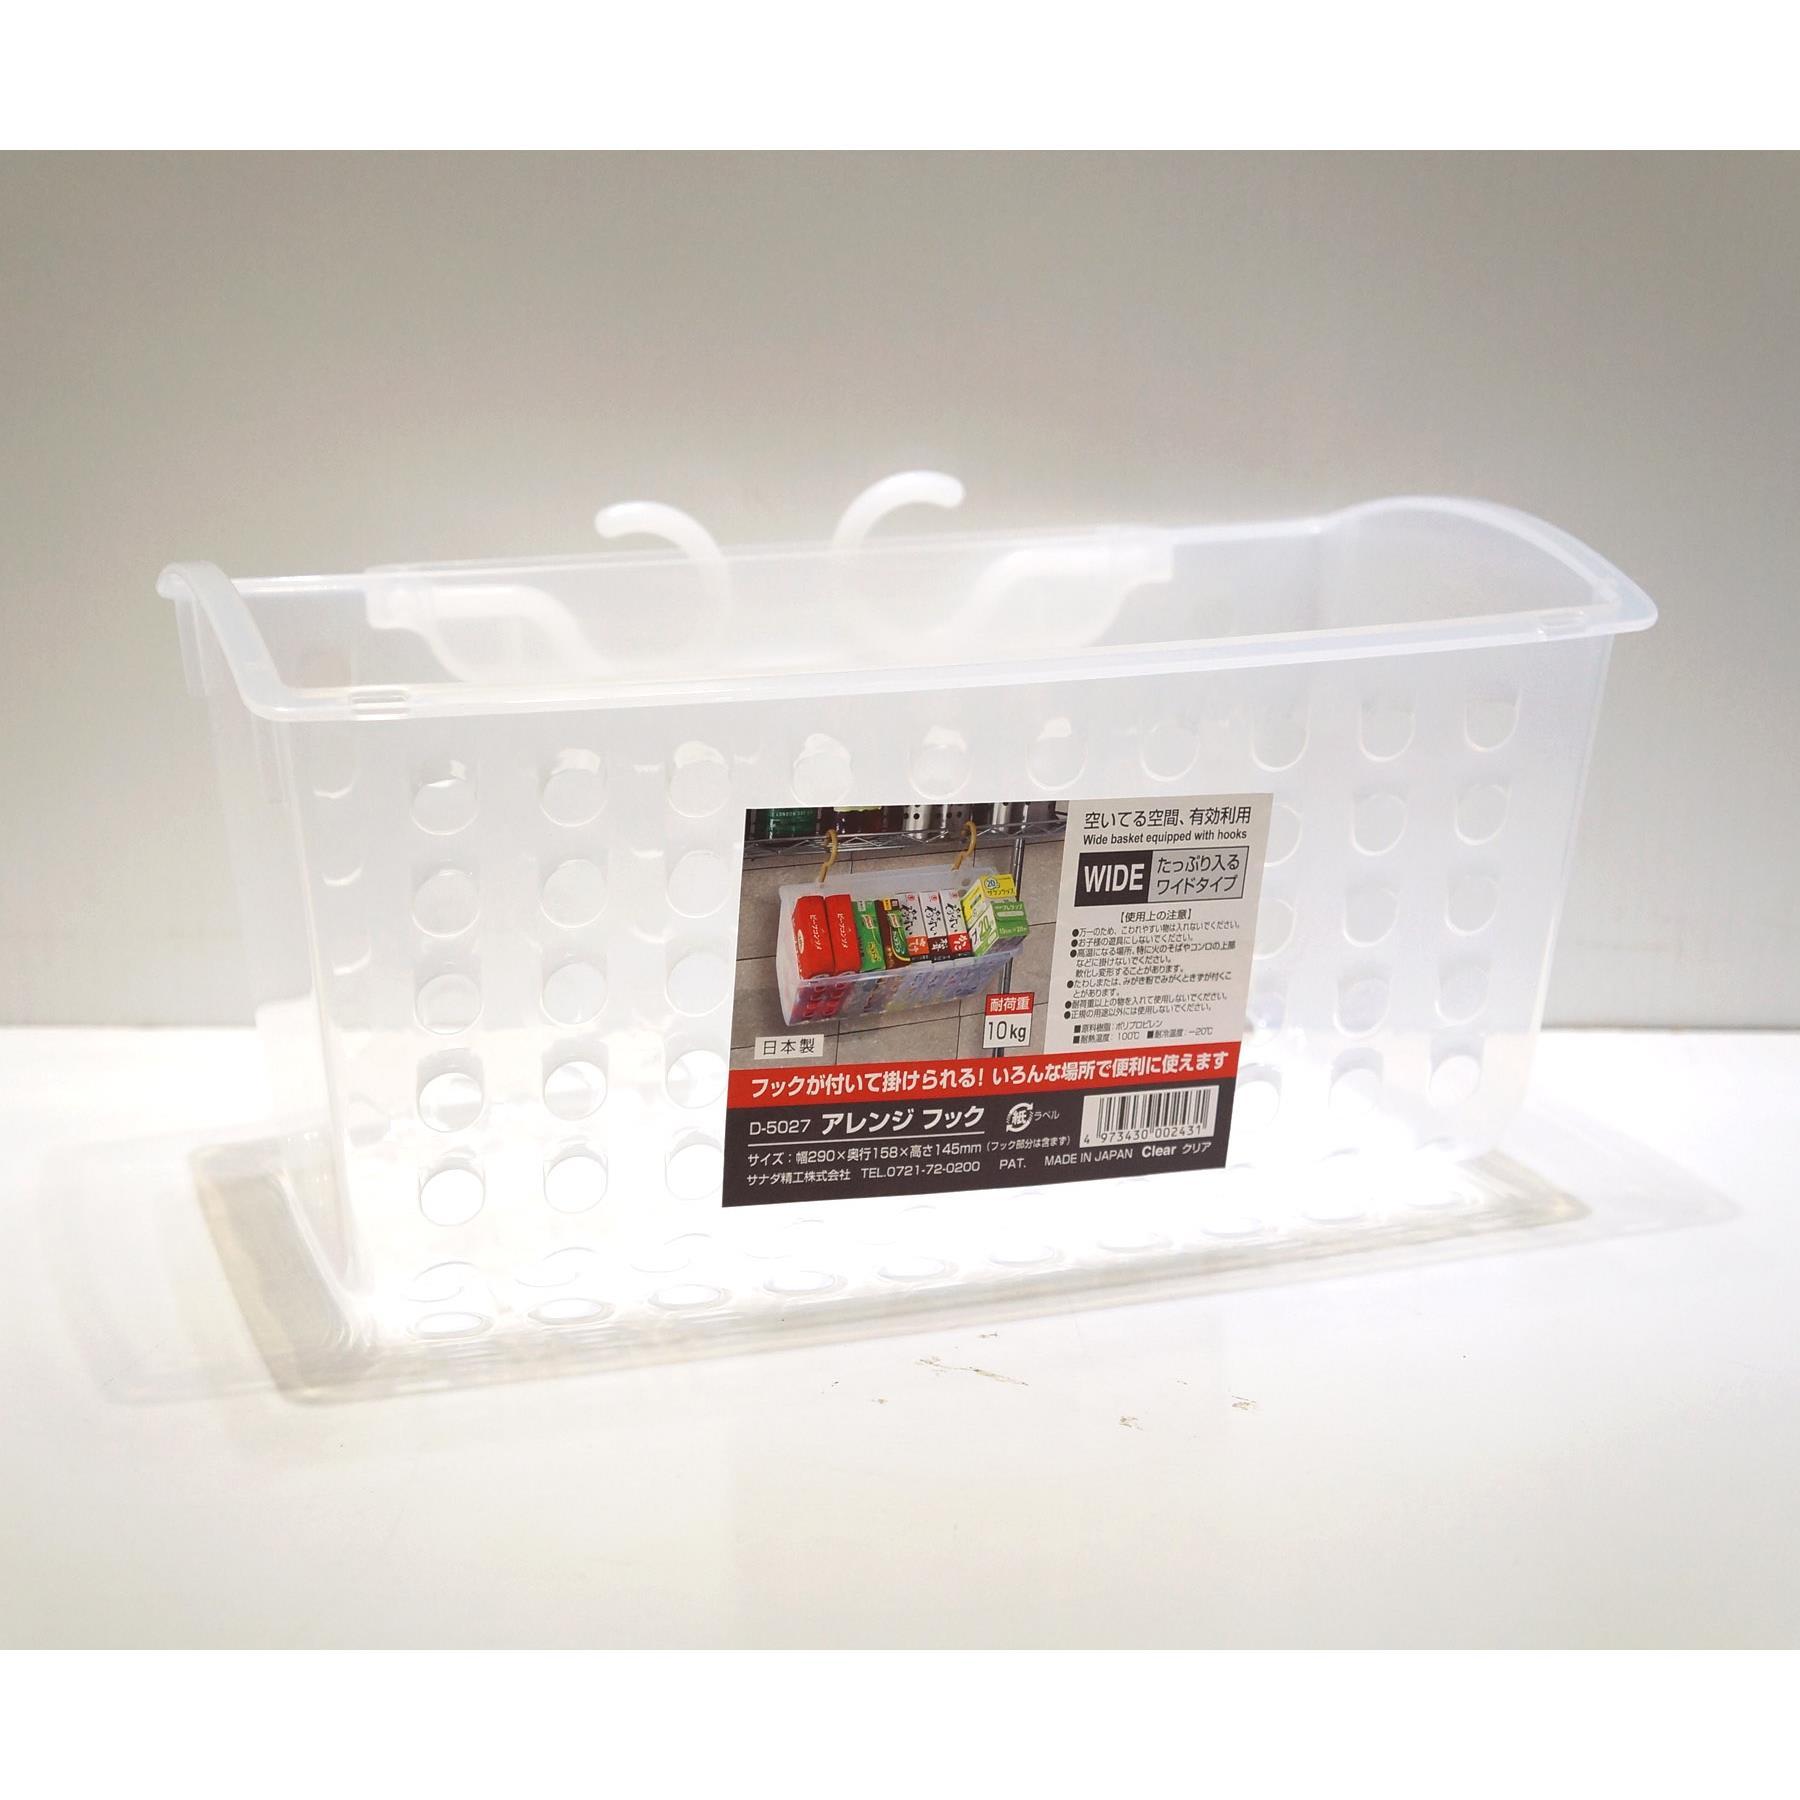 Giỏ nhựa Sanada Seiko có móc treo tiện ích